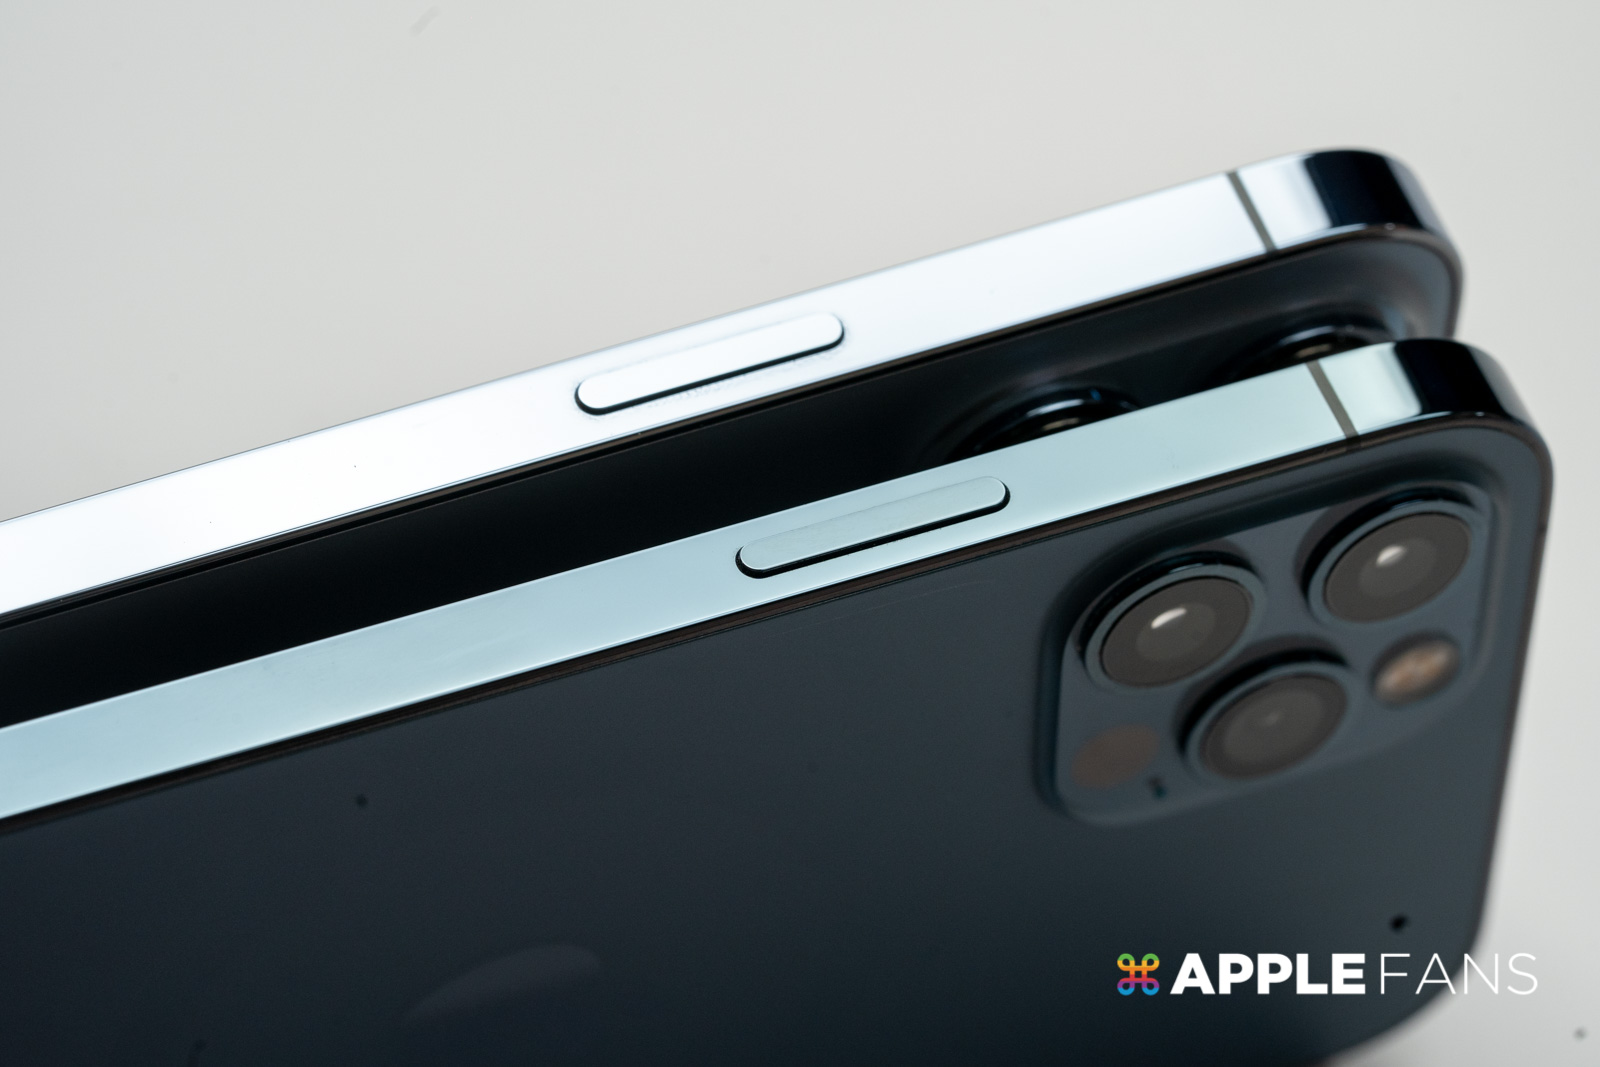 iPhone 13 的電源鍵位置下移